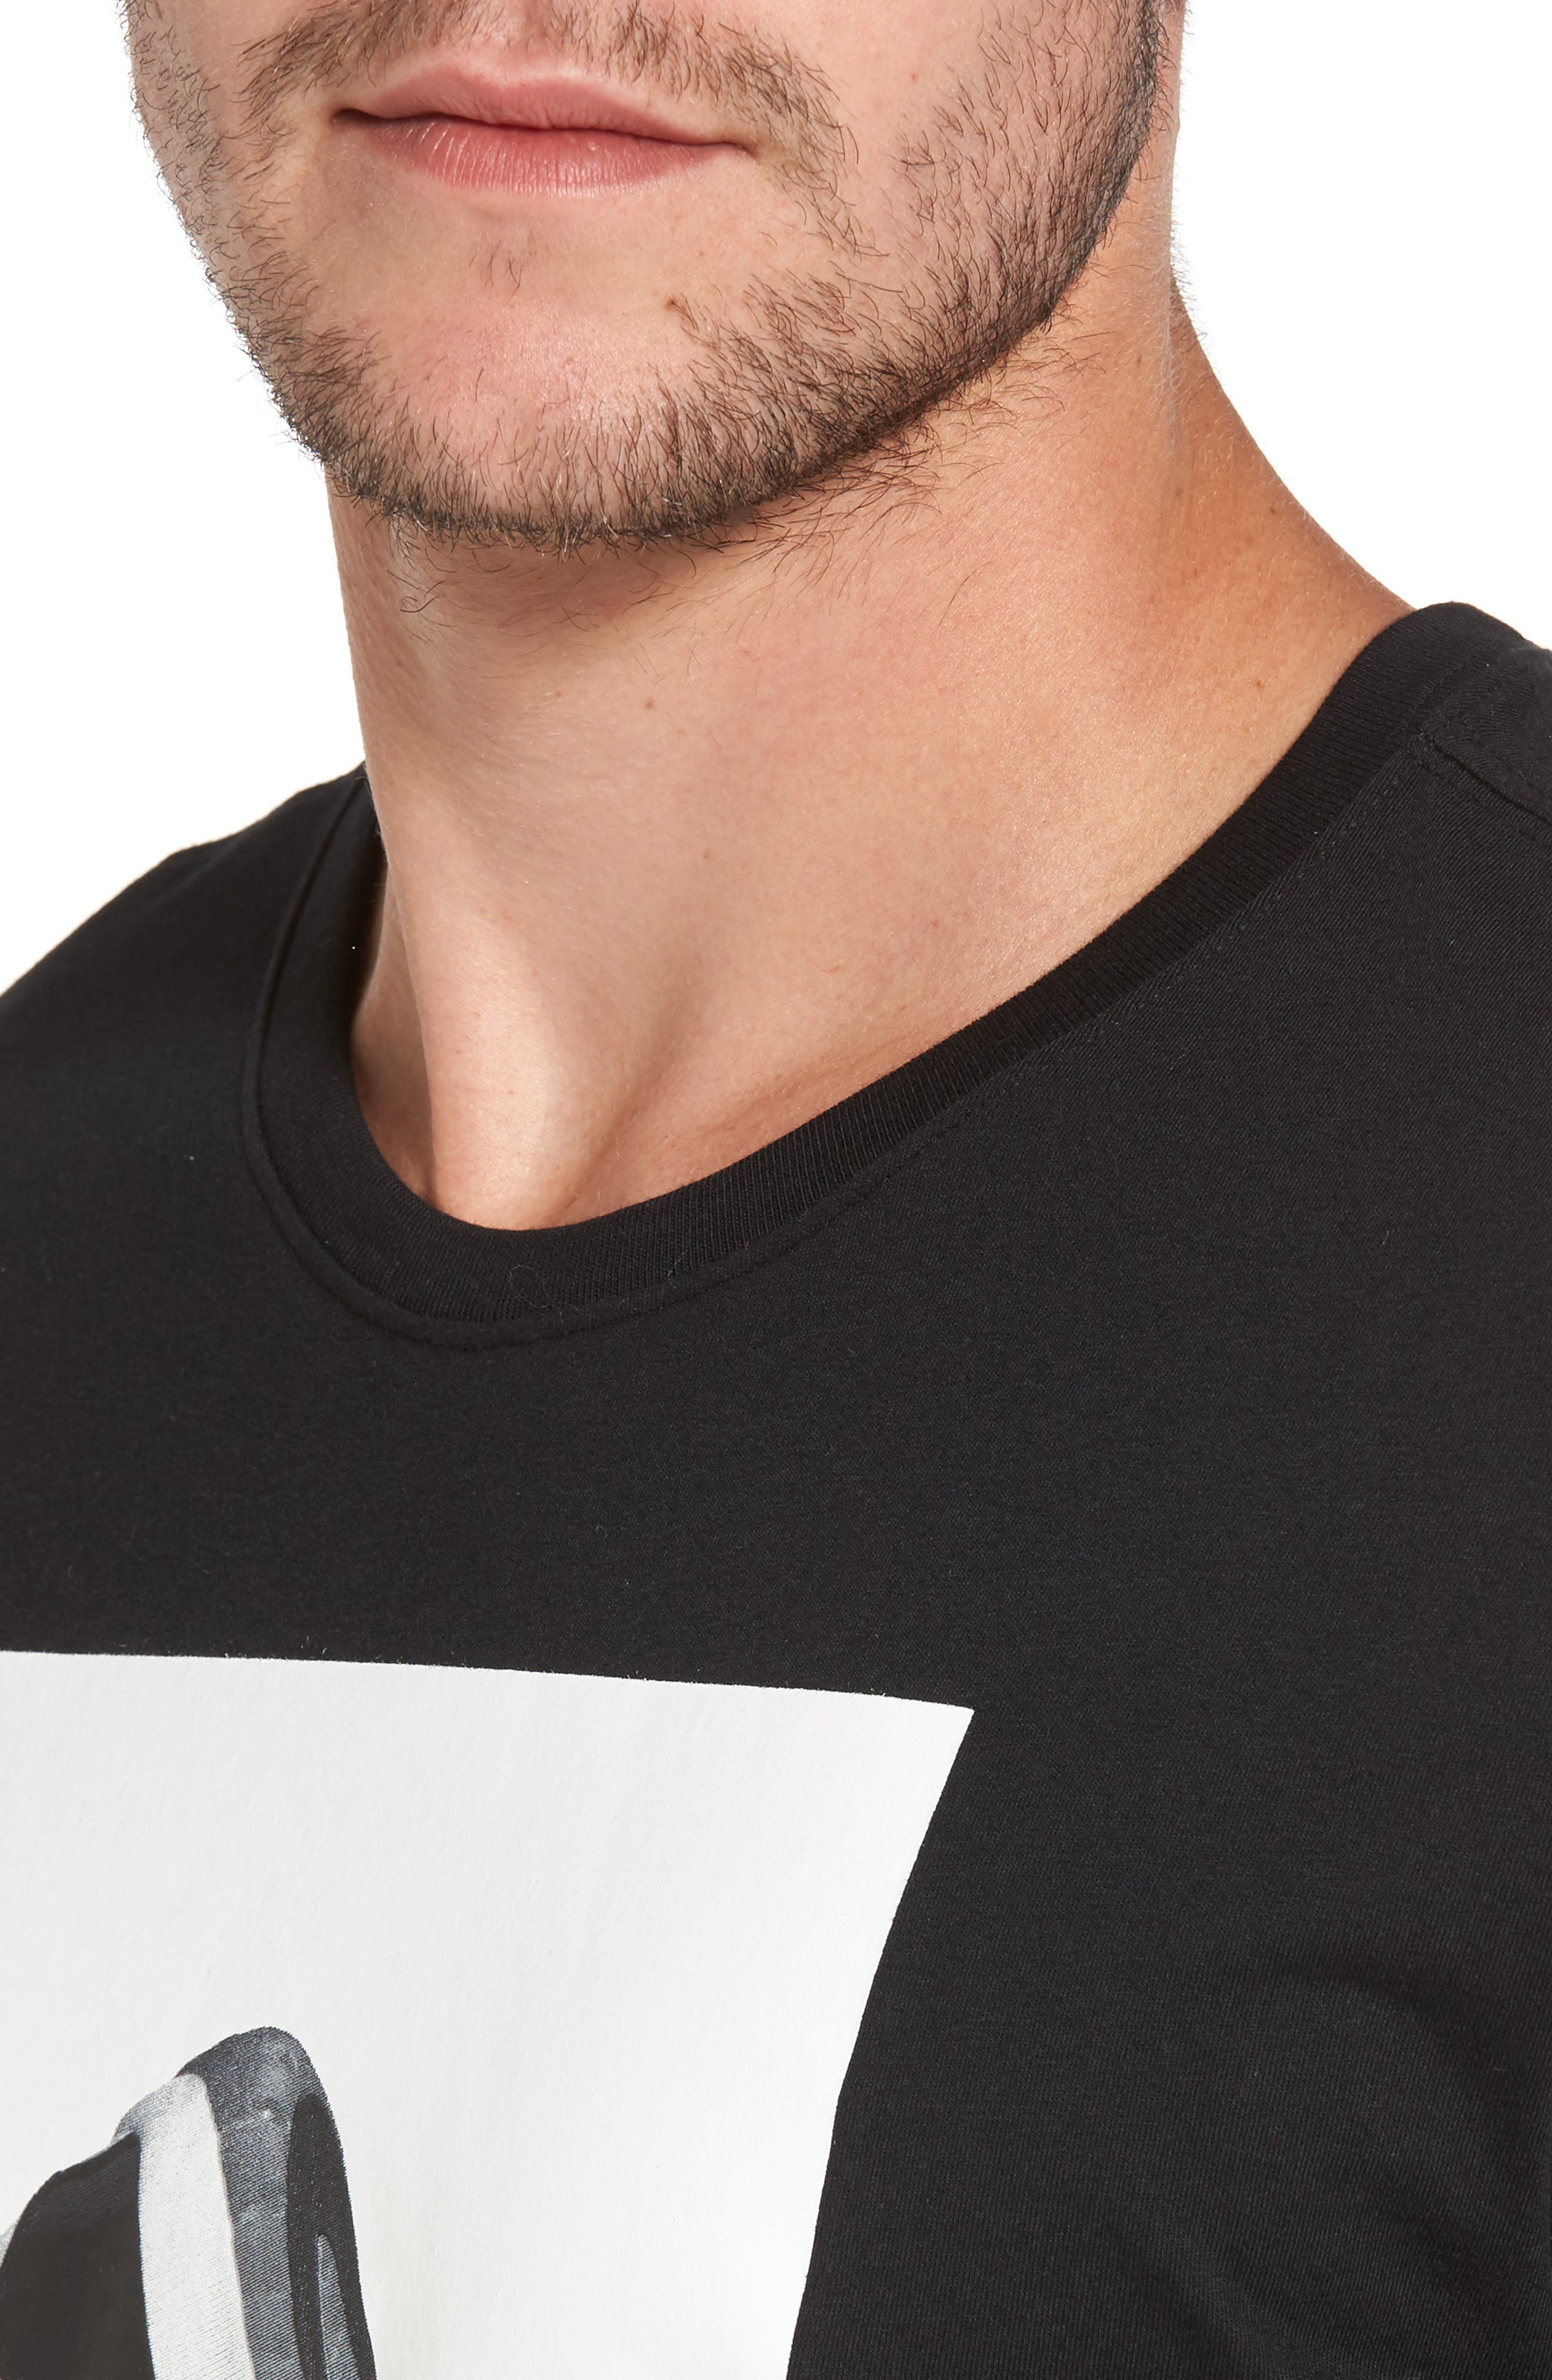 Sportswear AJ11 CNXN Graphic T-Shirt,                             Alternate thumbnail 4, color,                             Black